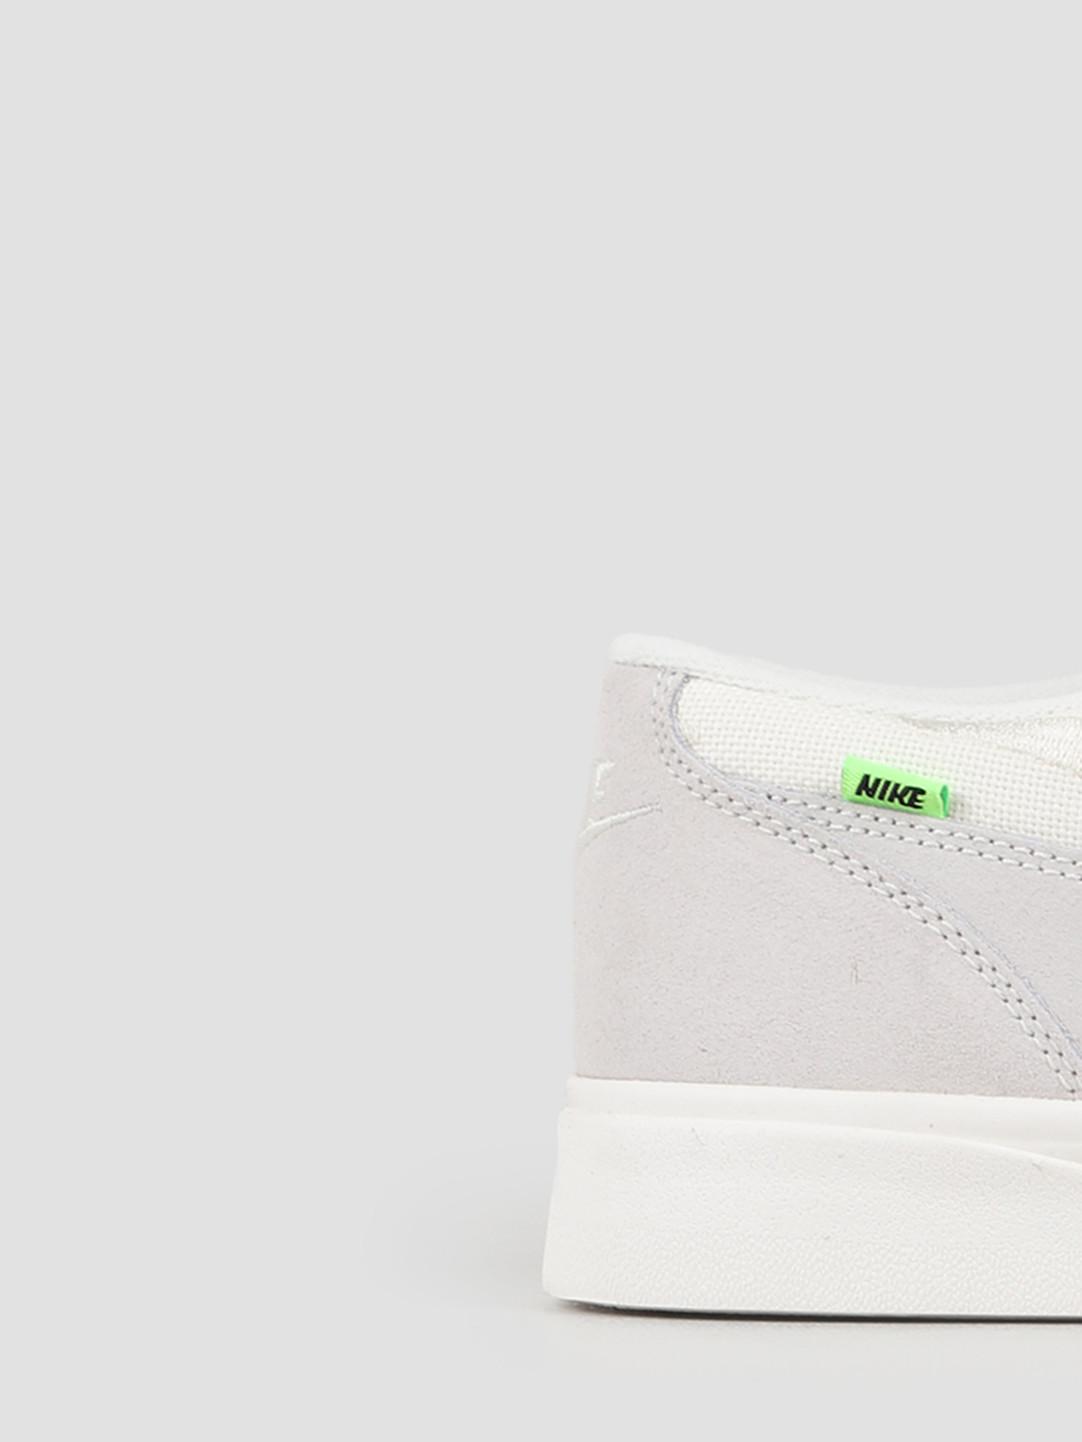 Nike Nike GTs '16 Txt Sail Sail-Electric Green-Black Cq6357-100